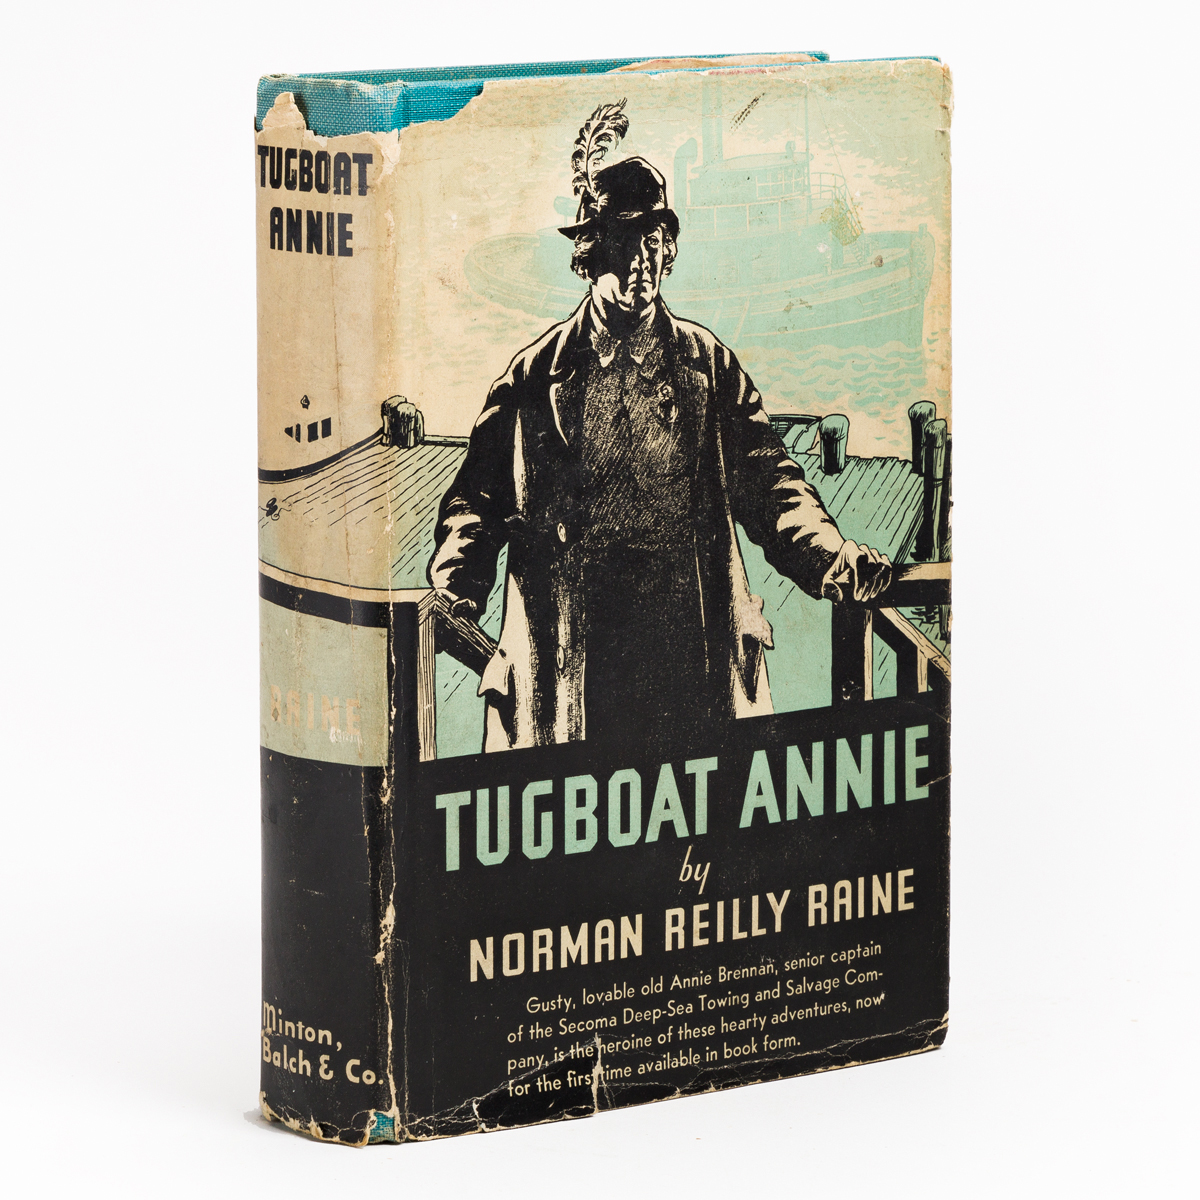 RAINE, NORMAN REILLY. Tugboat Annie.